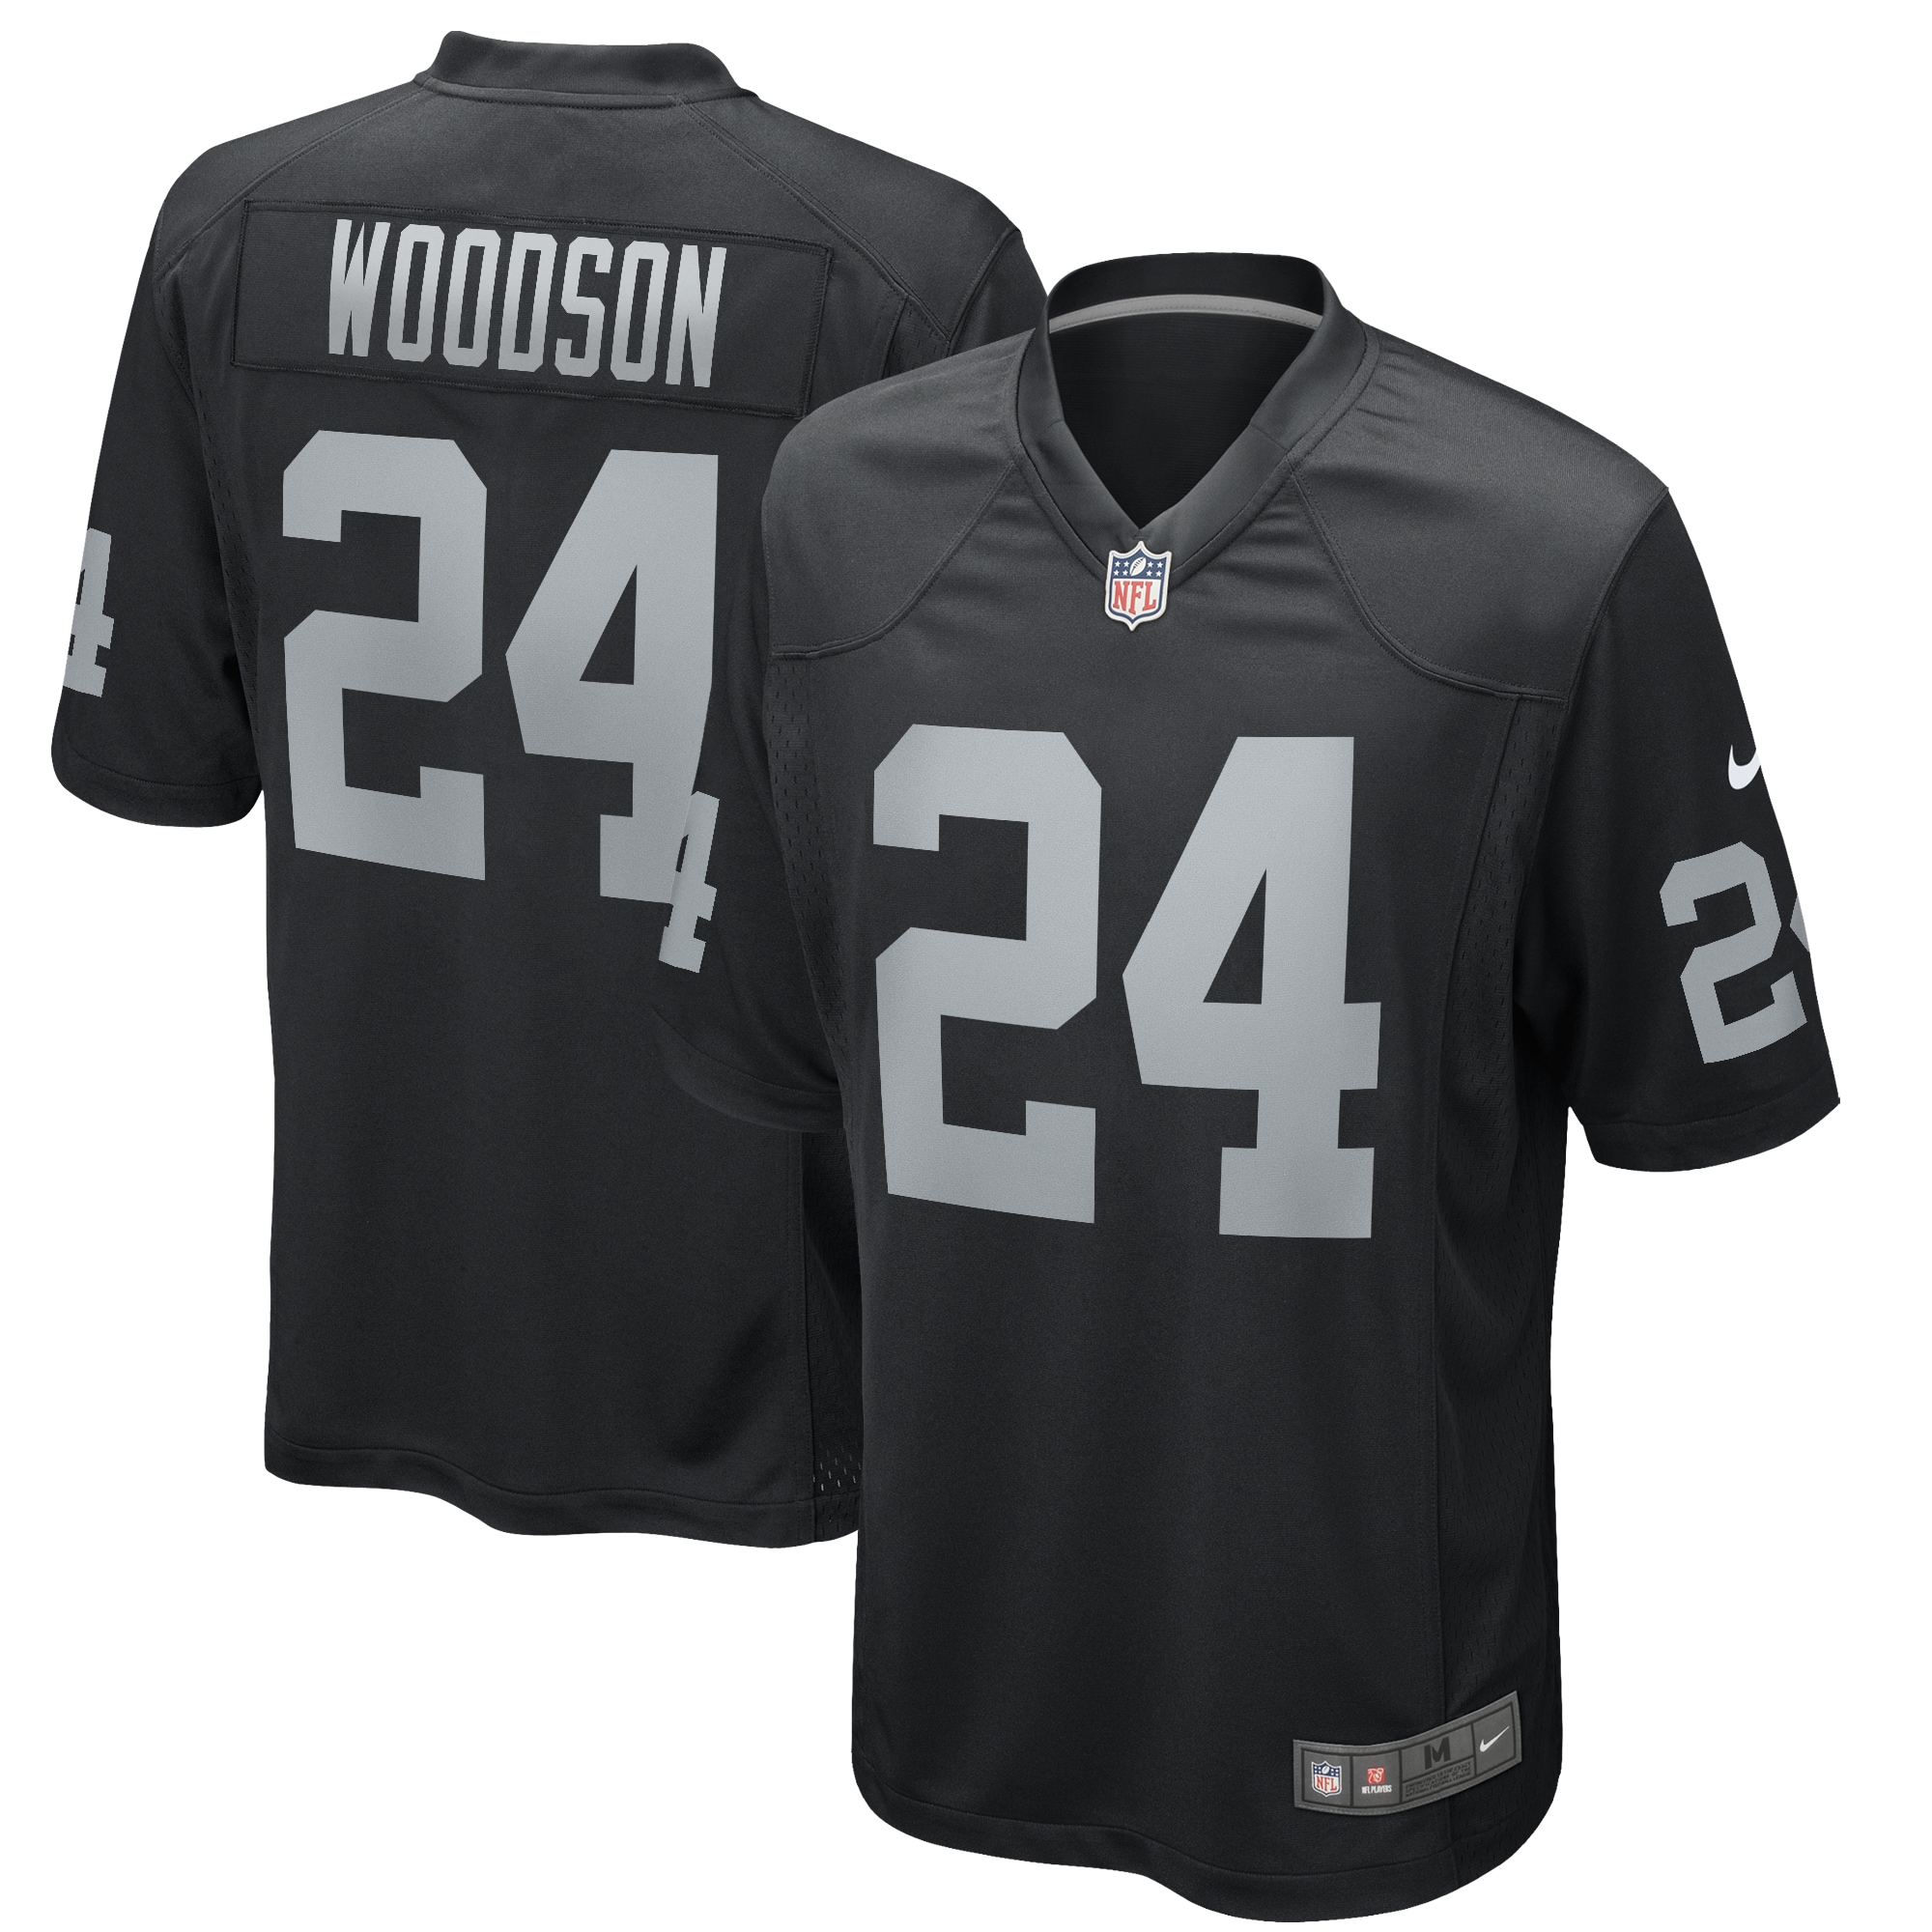 Charles Woodson Las Vegas Raiders Nike Game Retired Player Jersey - Black - Walmart.com